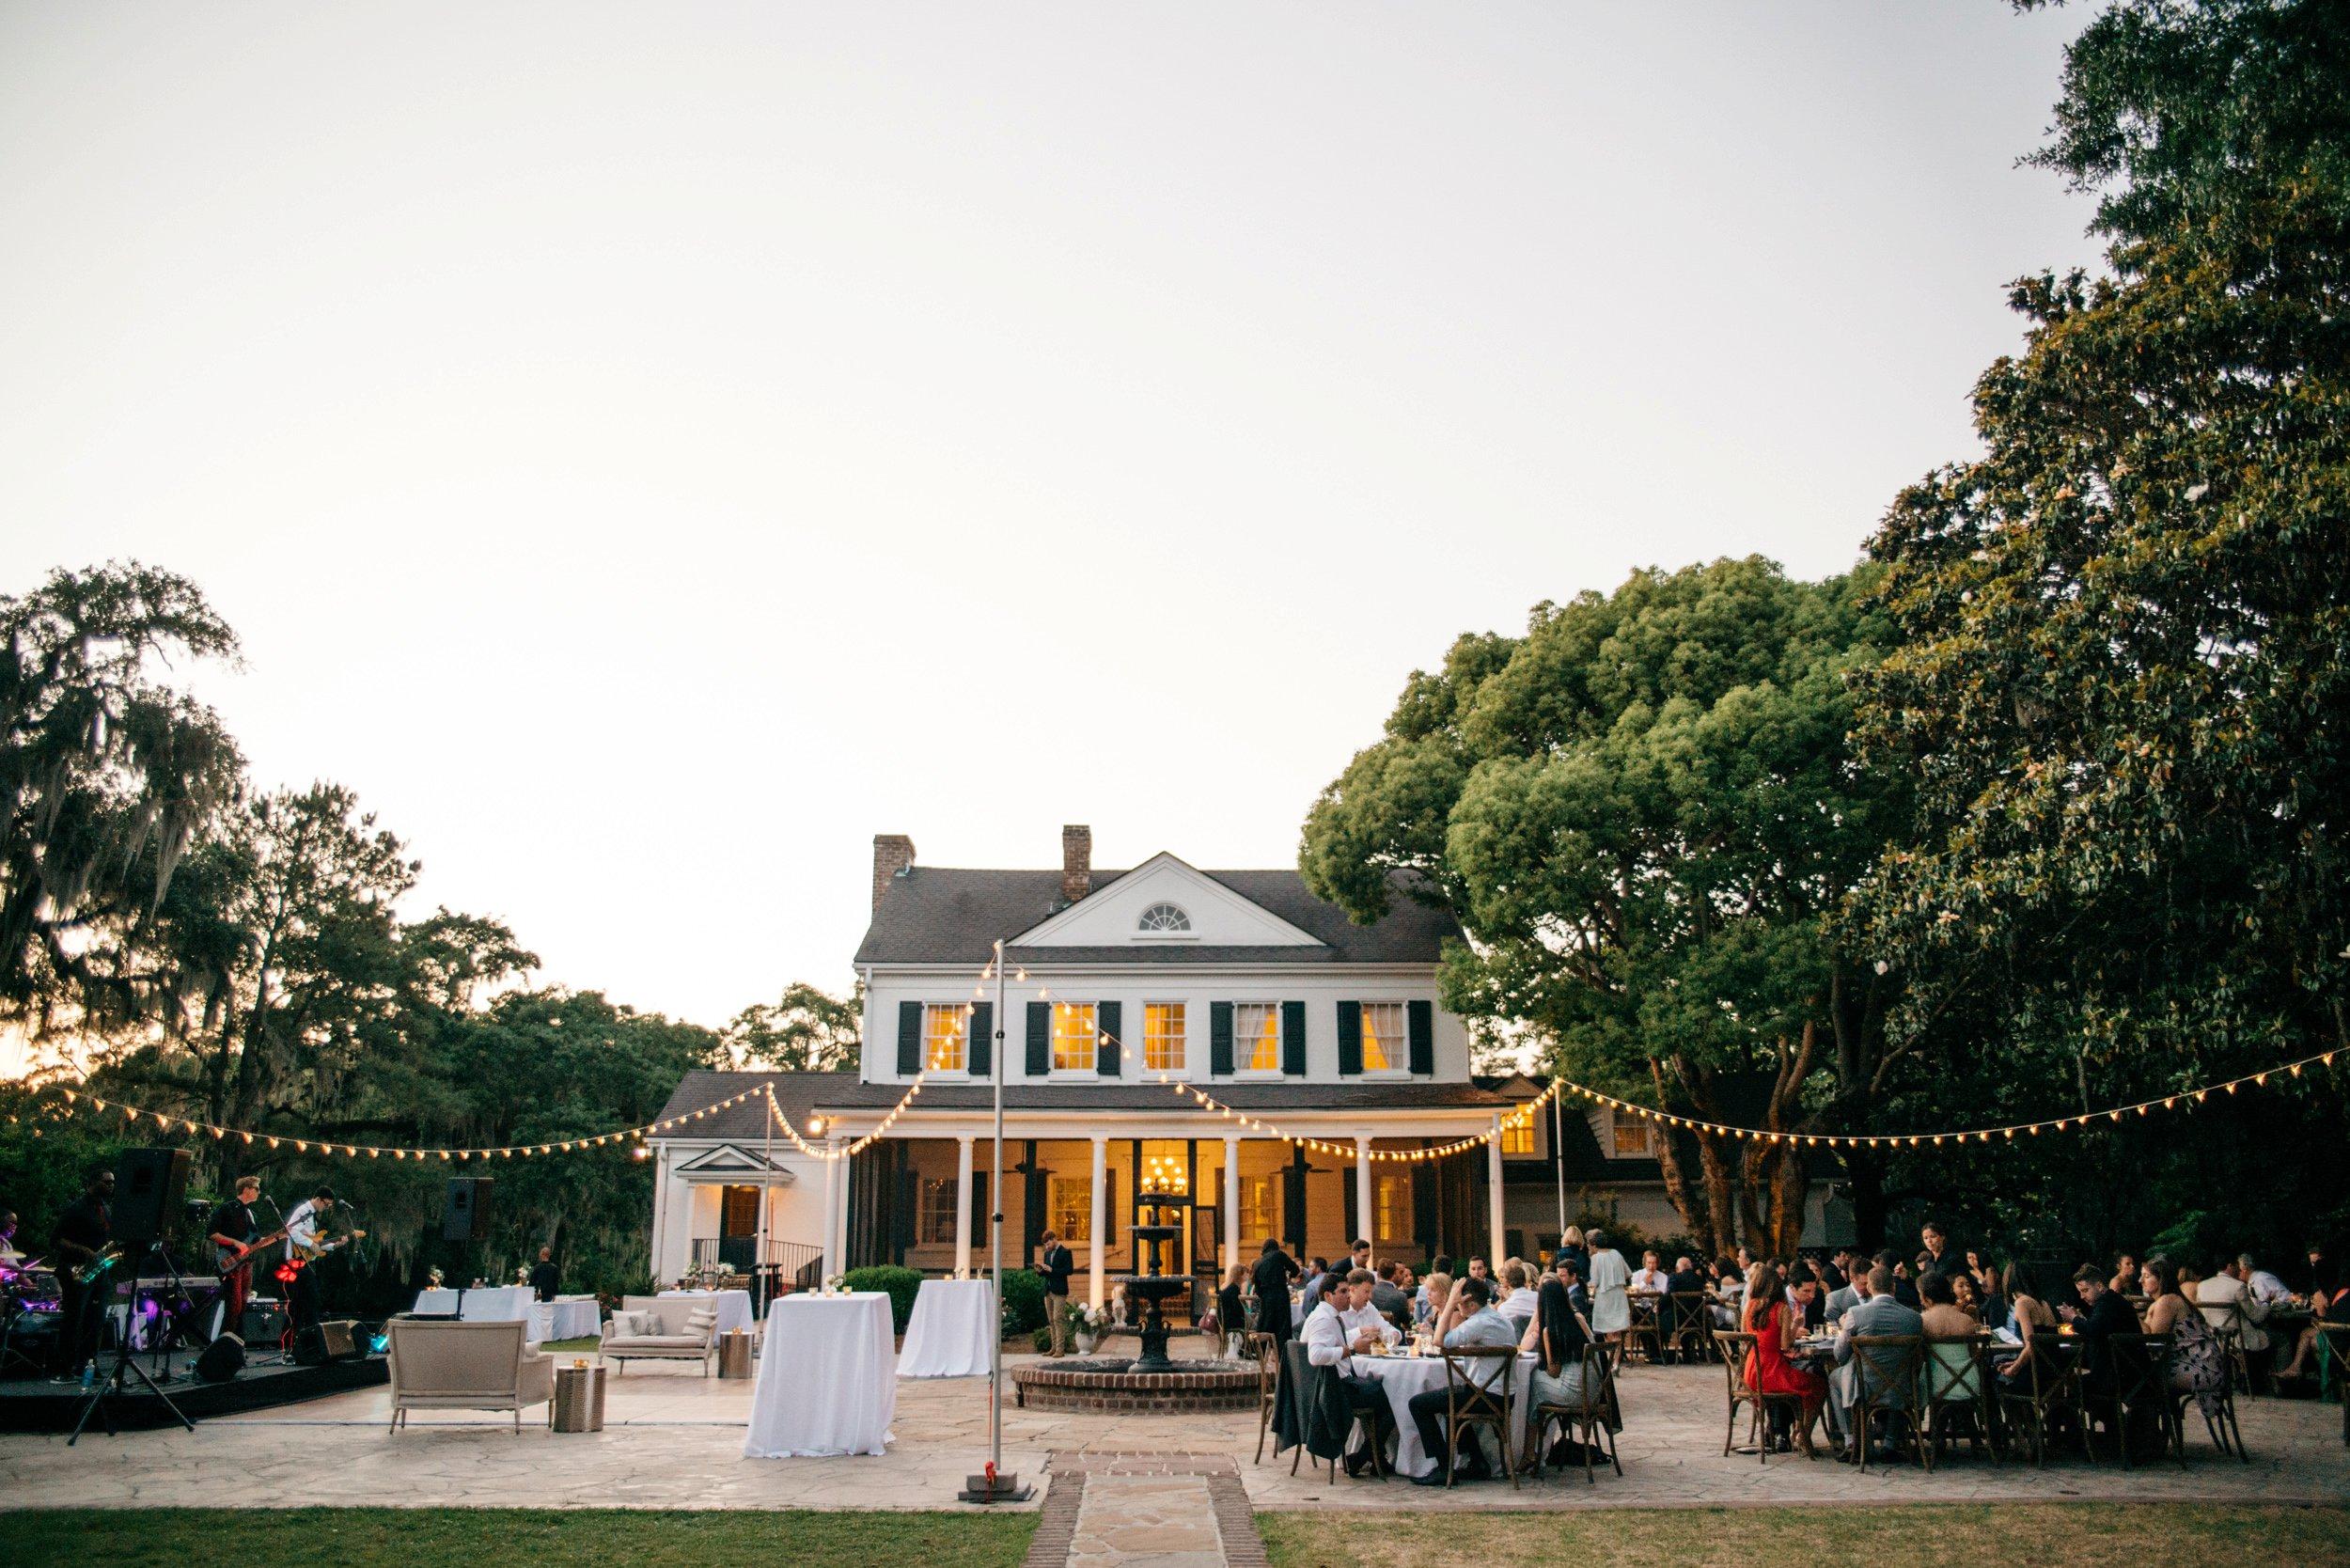 legare-waring-house-wedding-83.jpg